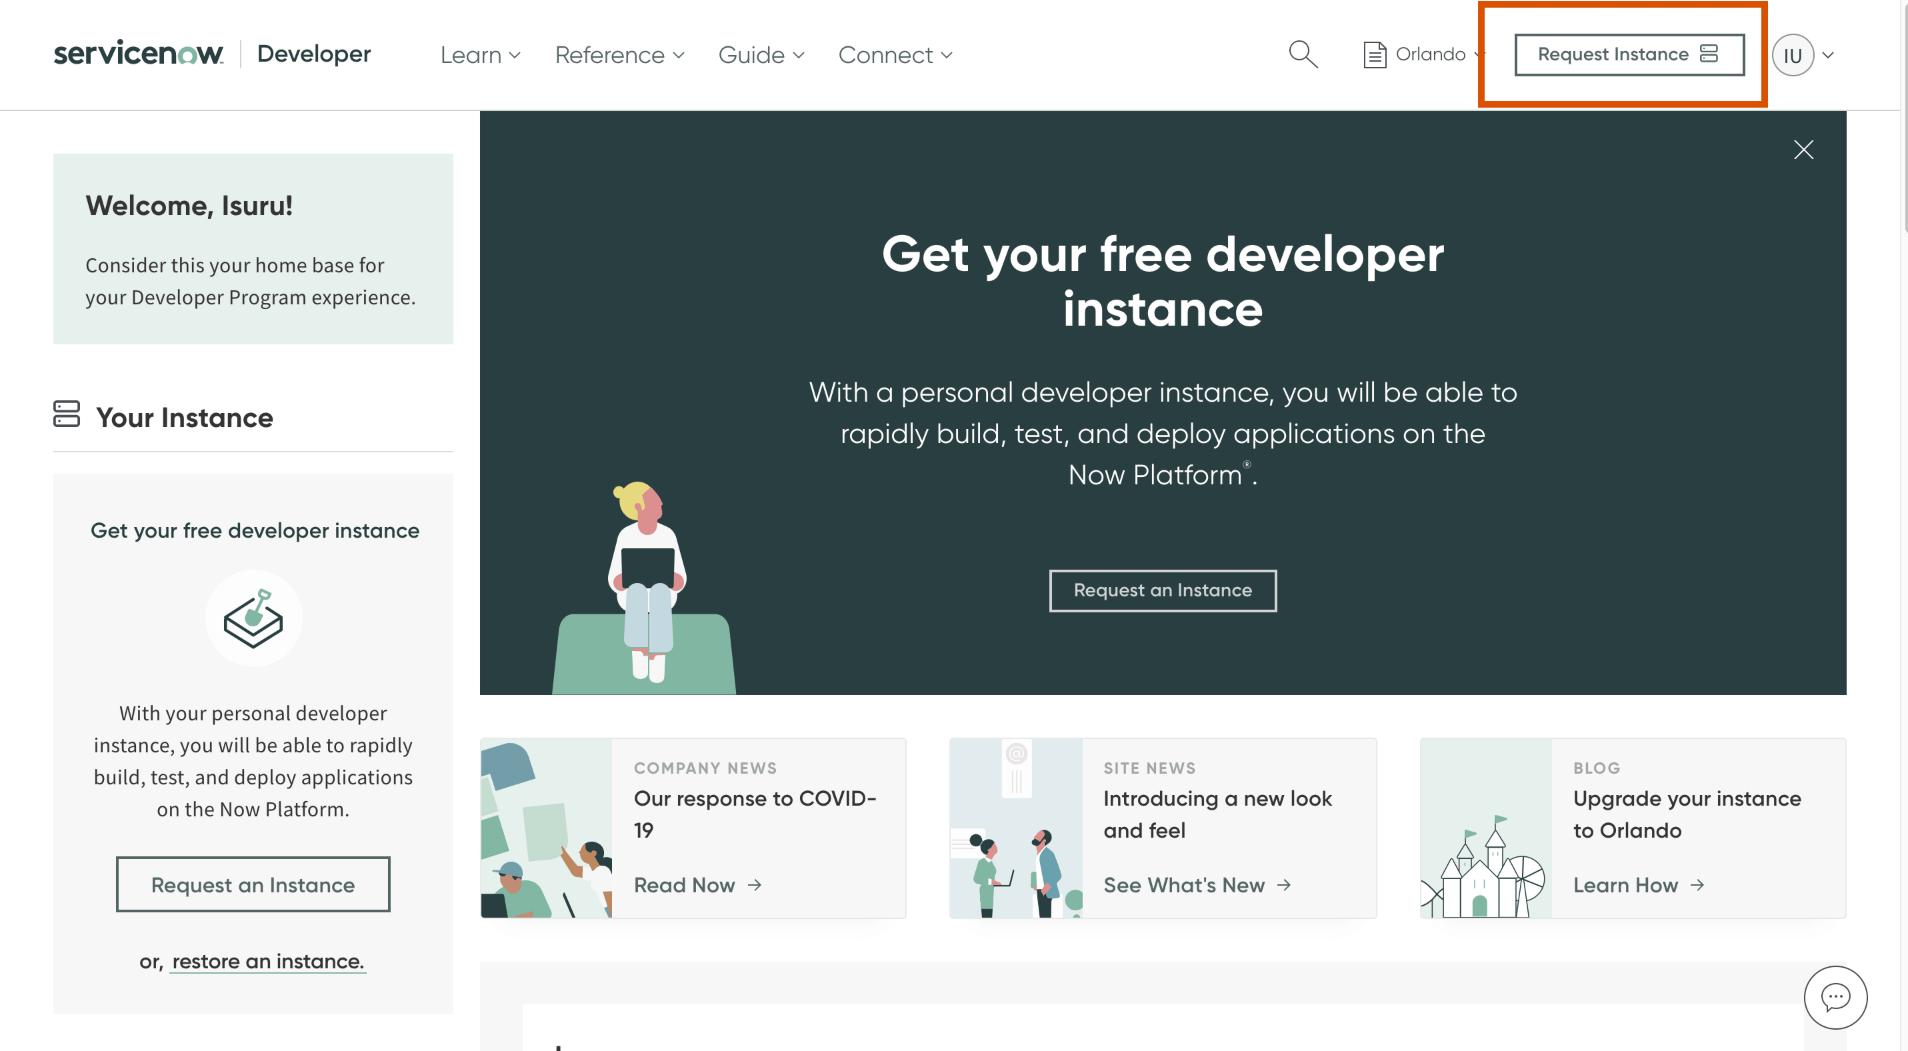 Login to Developer Account